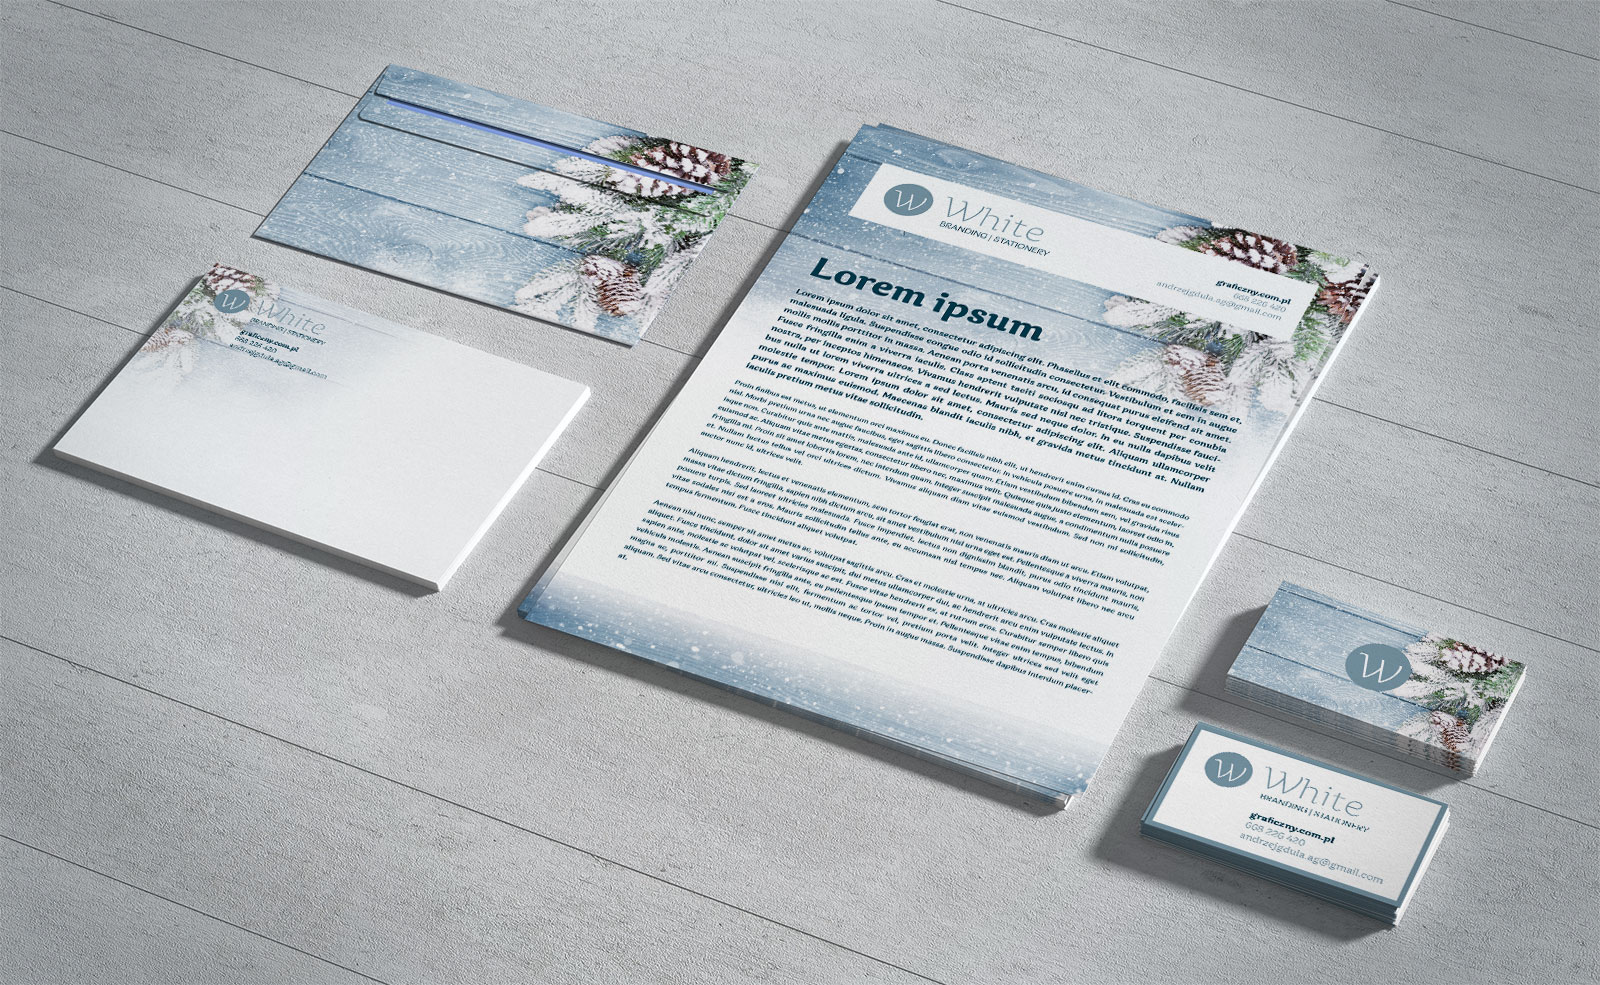 Free Branding Corporate Identity Stationery Mockup (1)